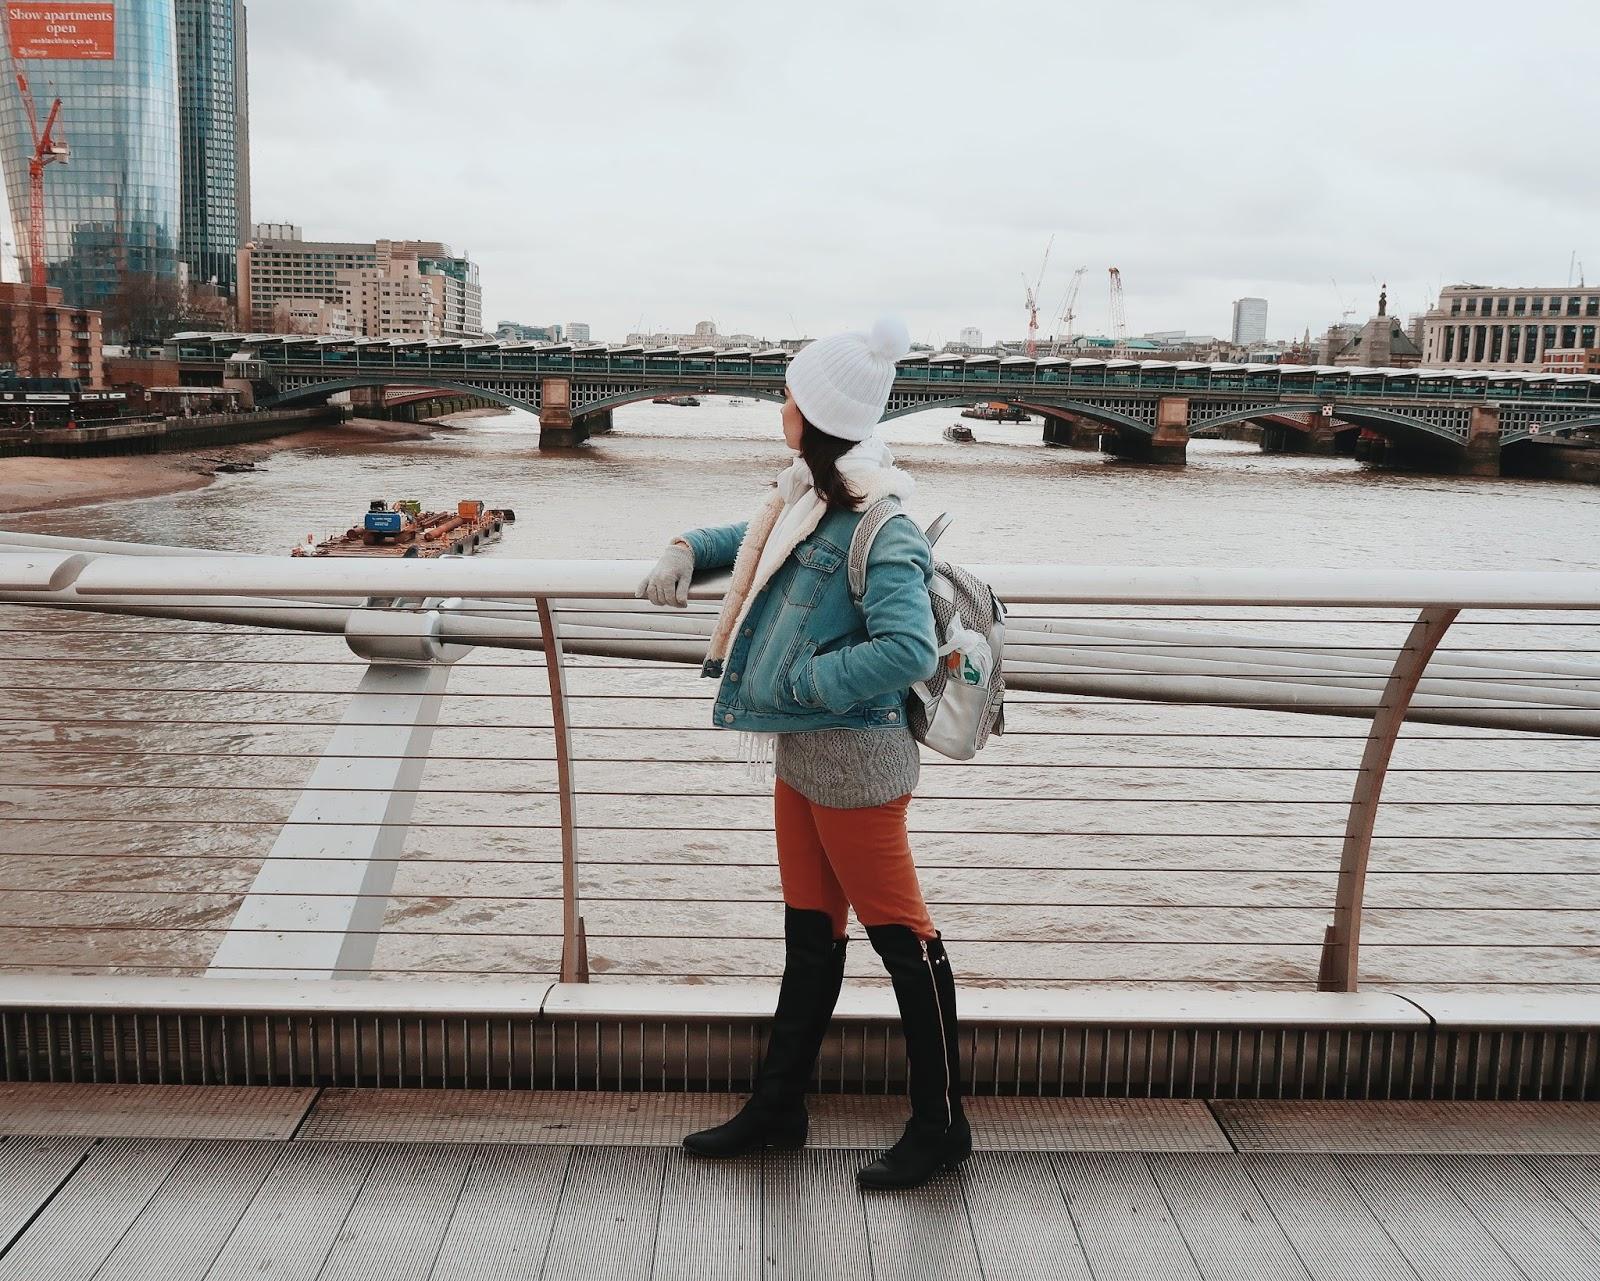 londres-ponte-do-milenio